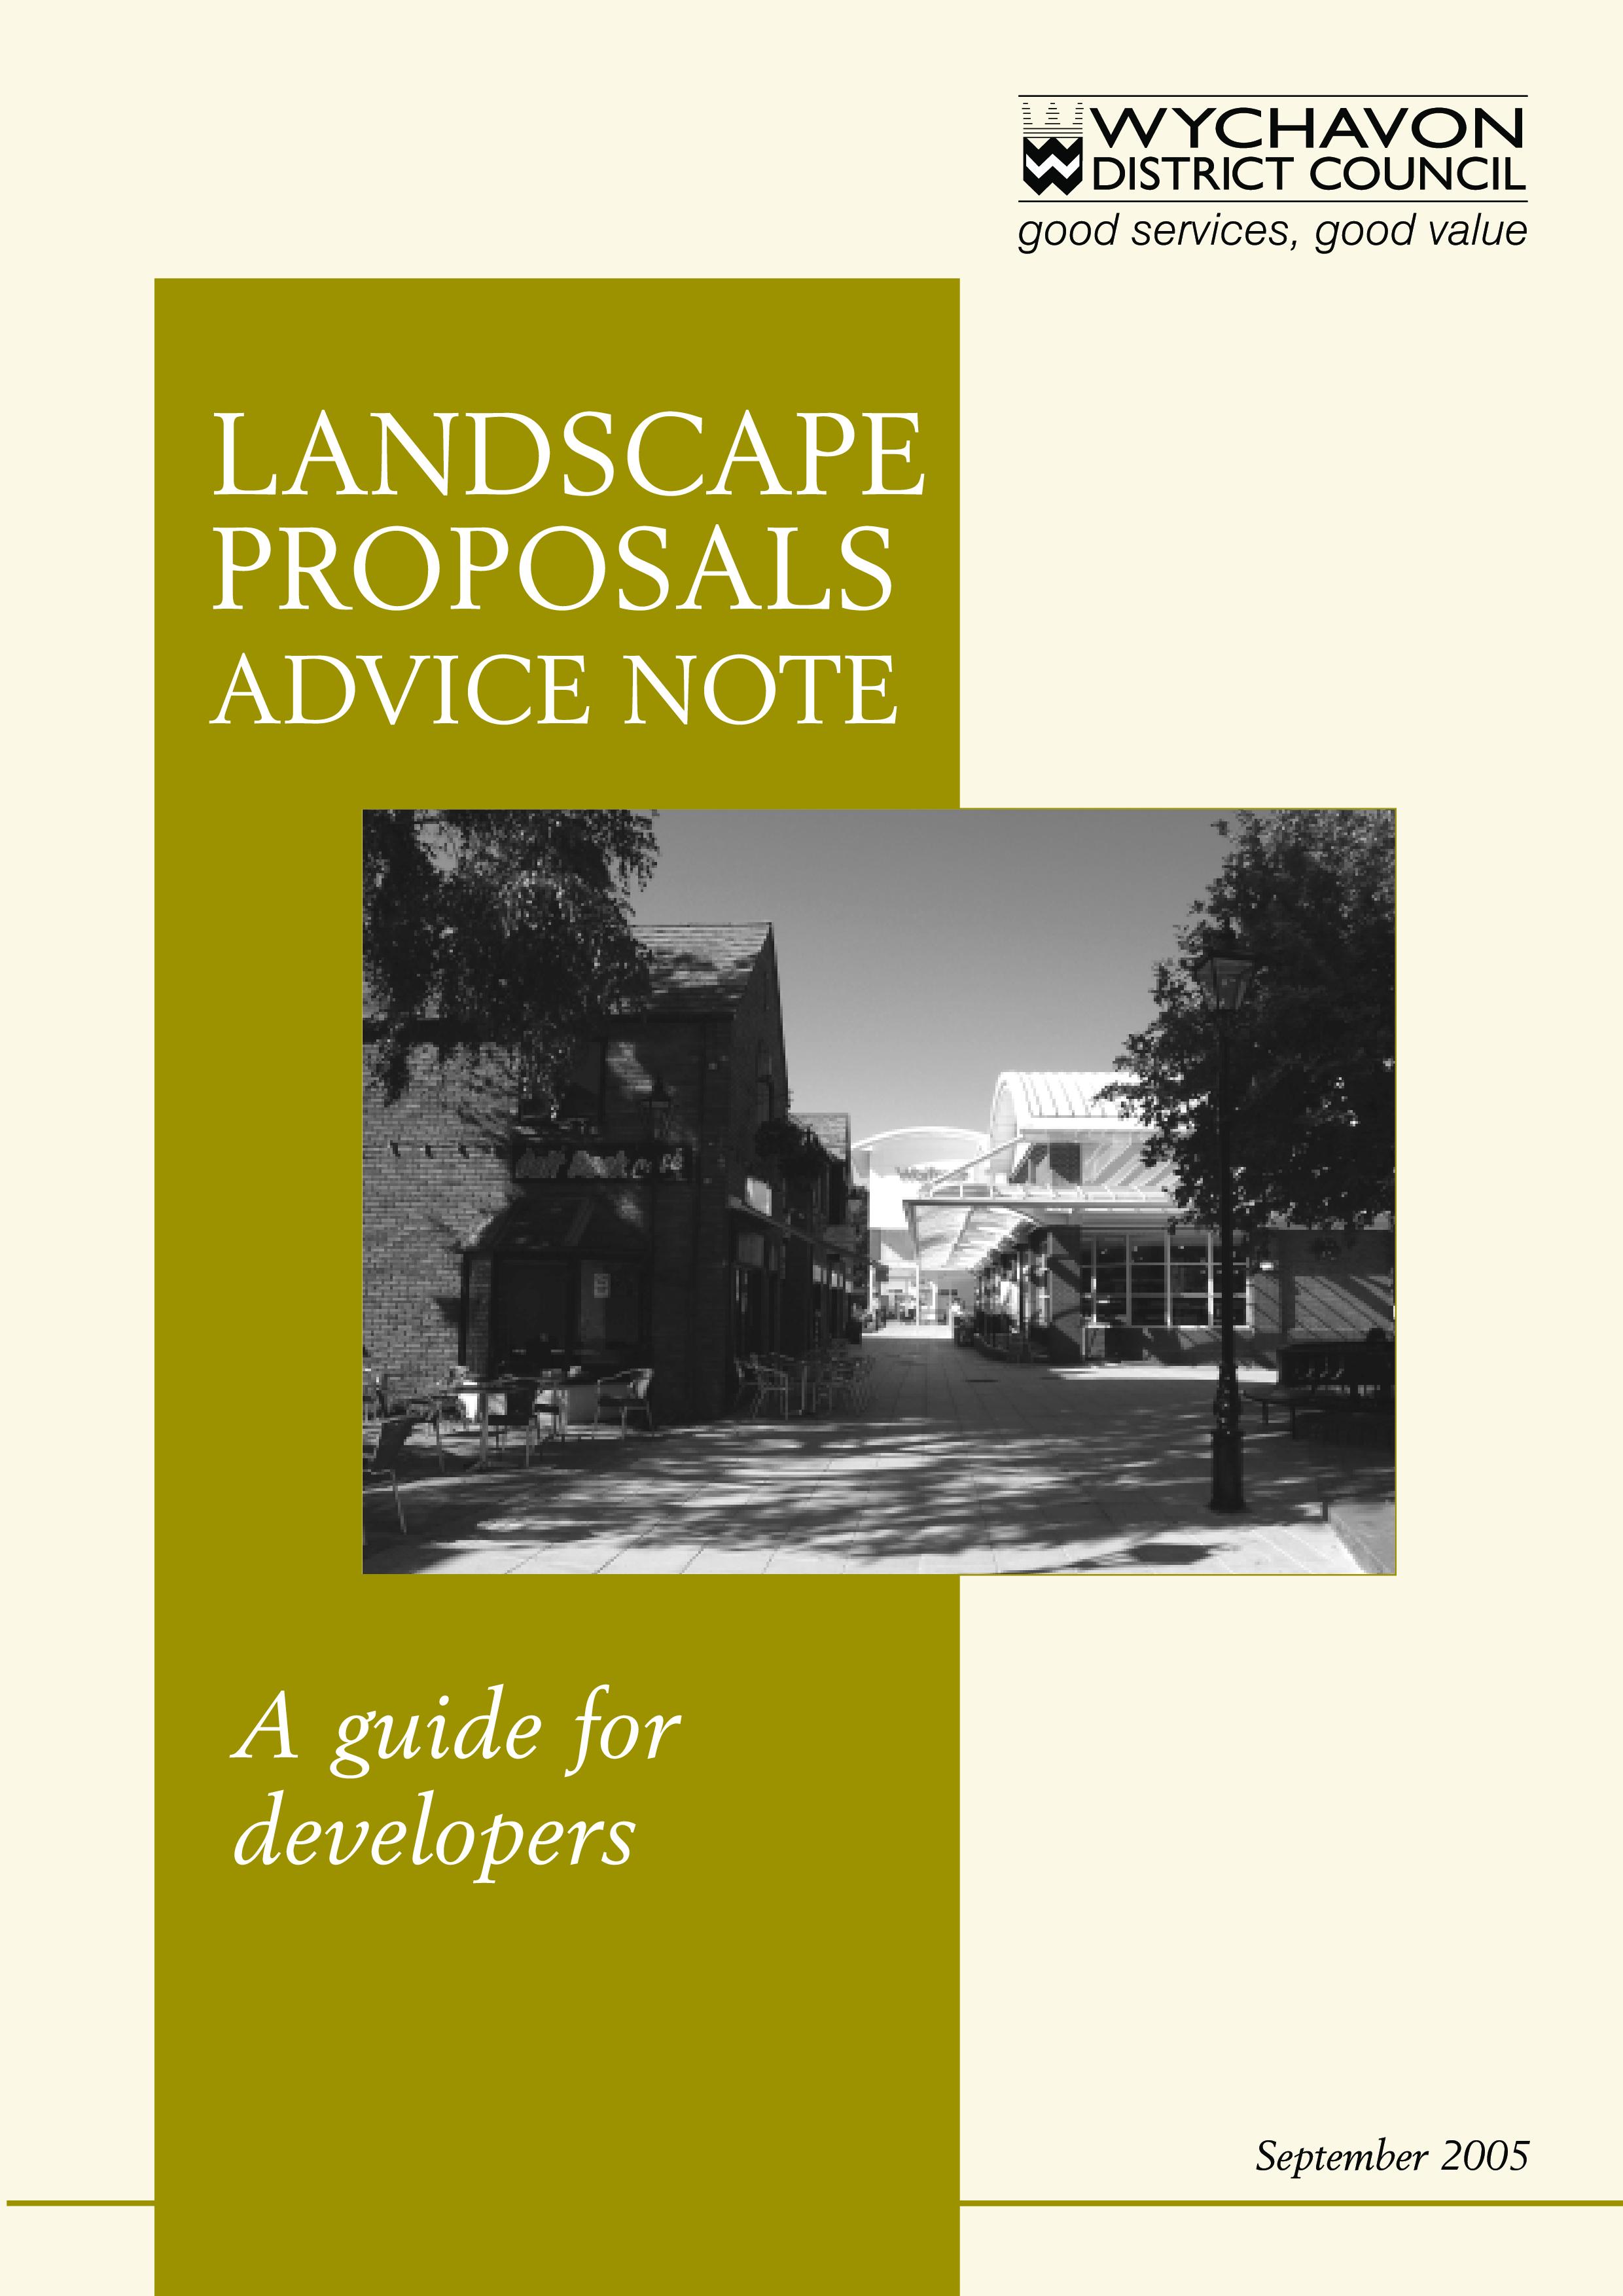 Free Heritage Landscape Proposal Templates At Allbusinesstemplates Com